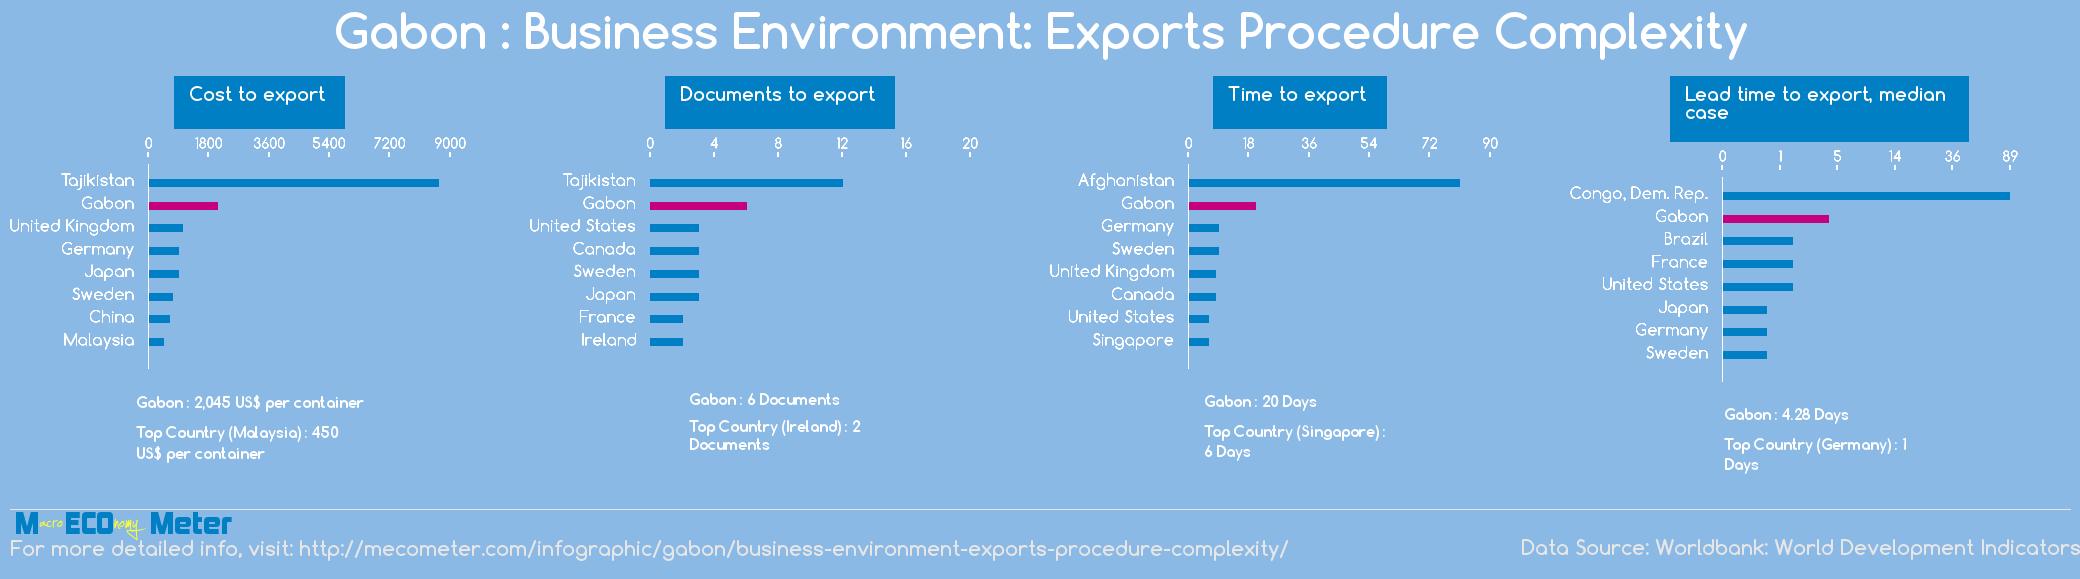 Gabon : Business Environment: Exports Procedure Complexity